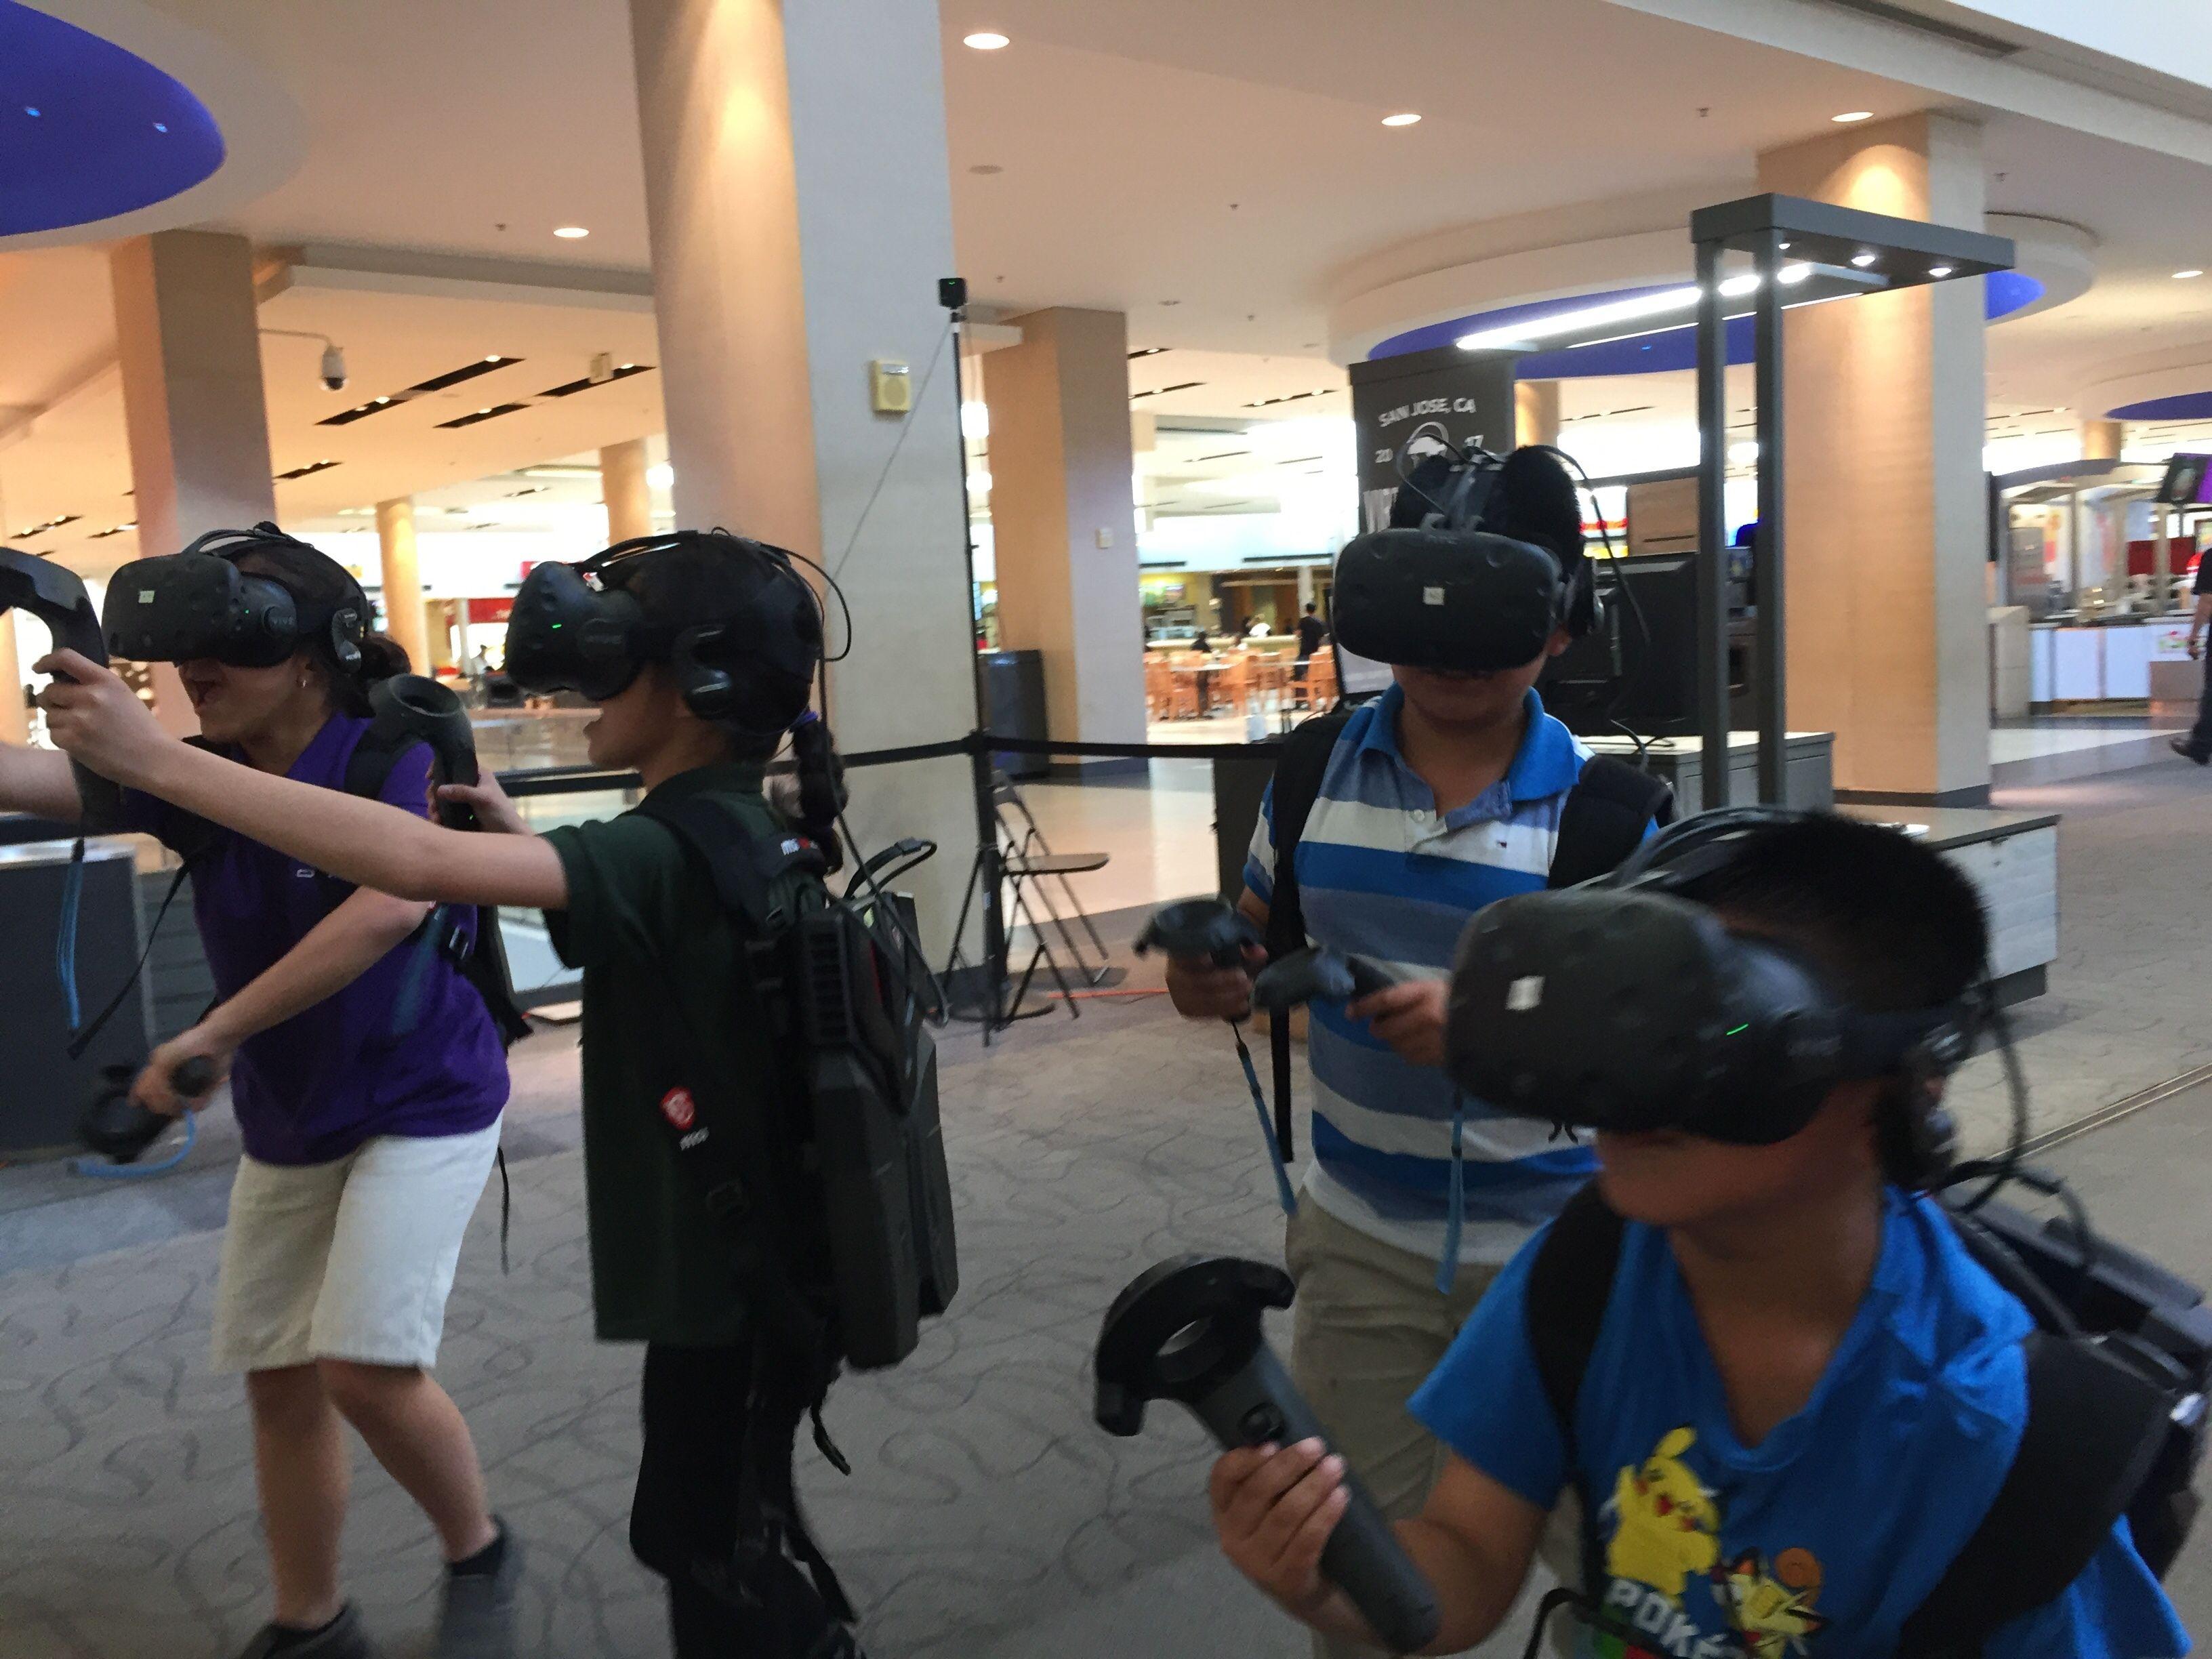 Virtual World Arcade